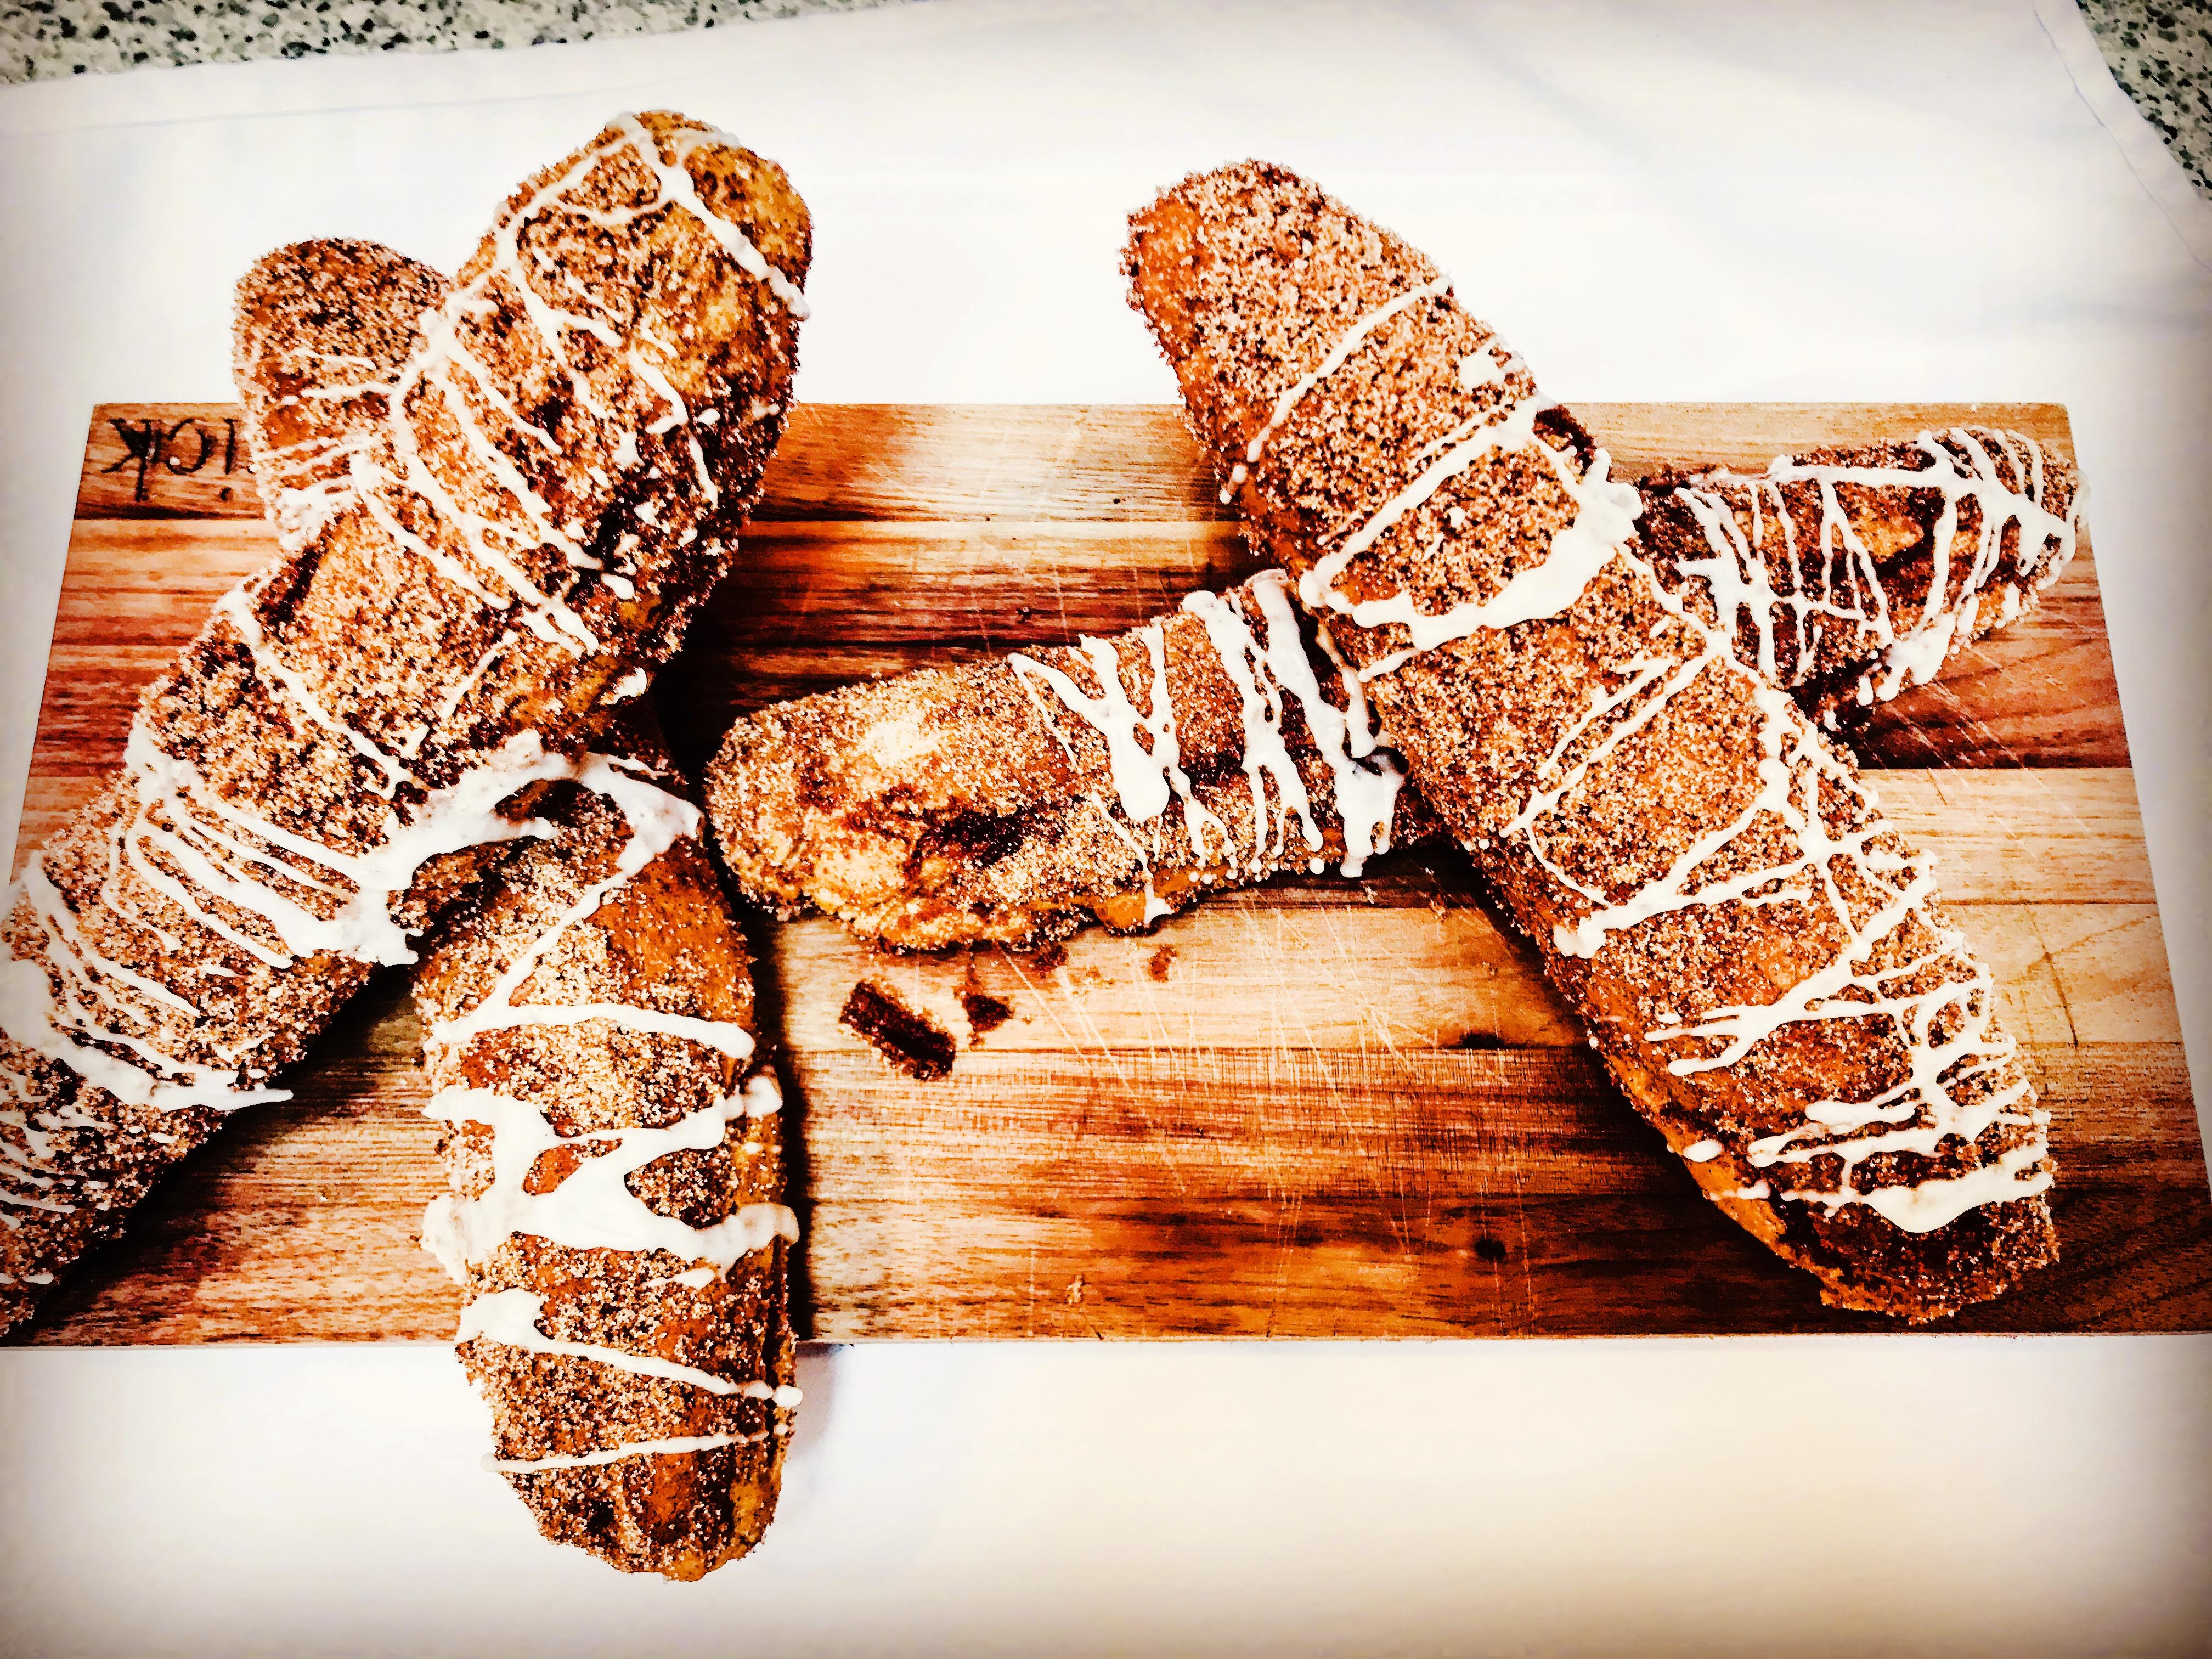 Patrick's Cinnamon Soft Pretzel/Breadsticks